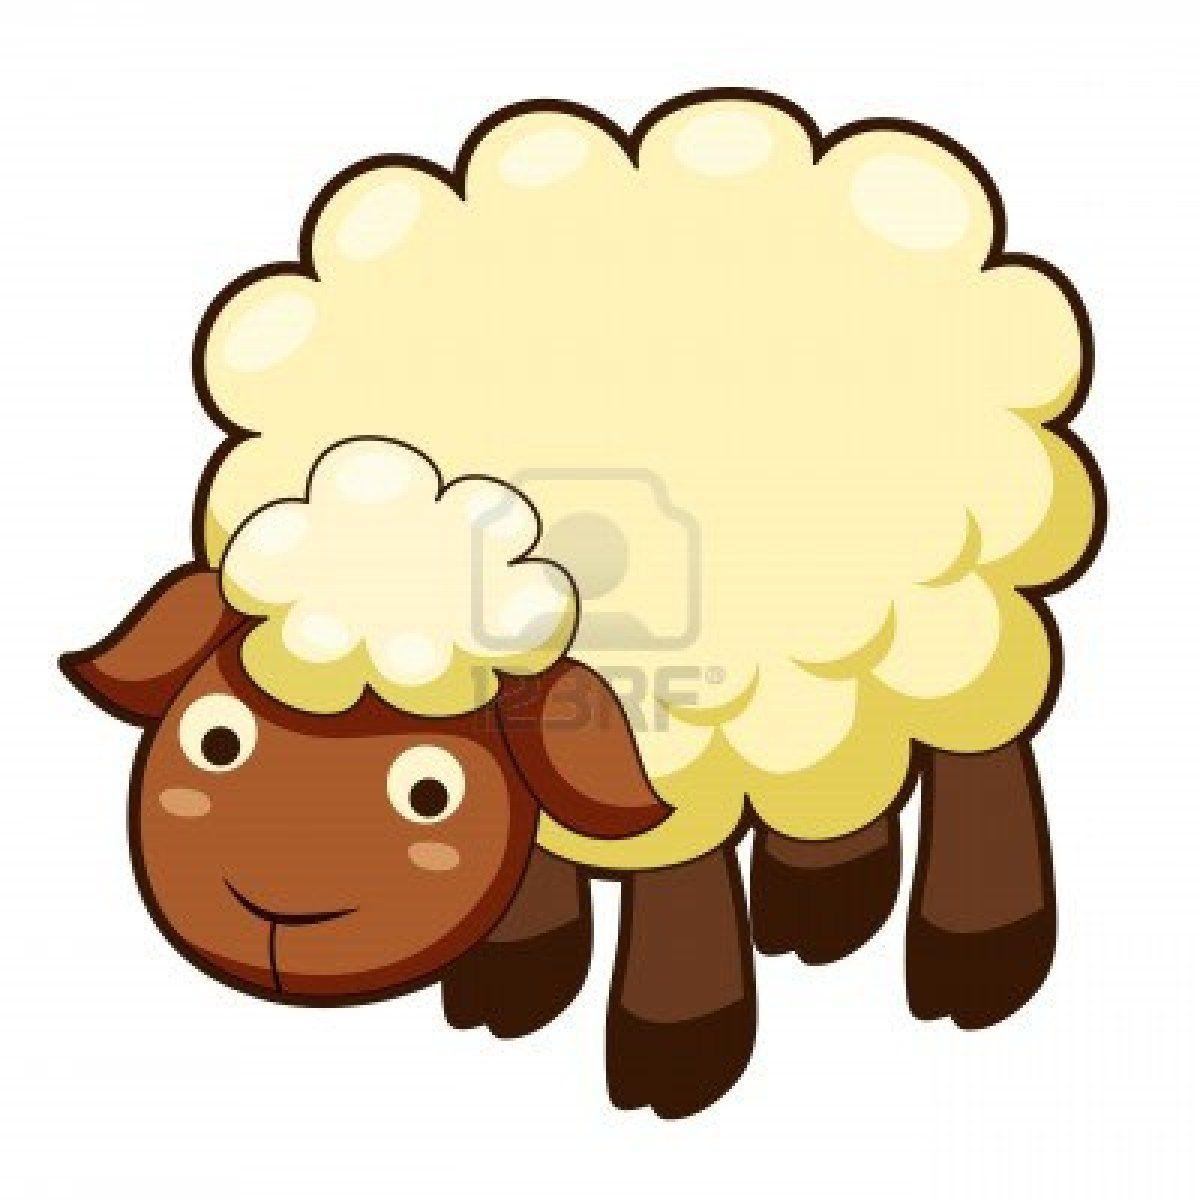 1200x1200 Cute Sheep Images Cute Sheep Clipart Black And White , Ipad Mini